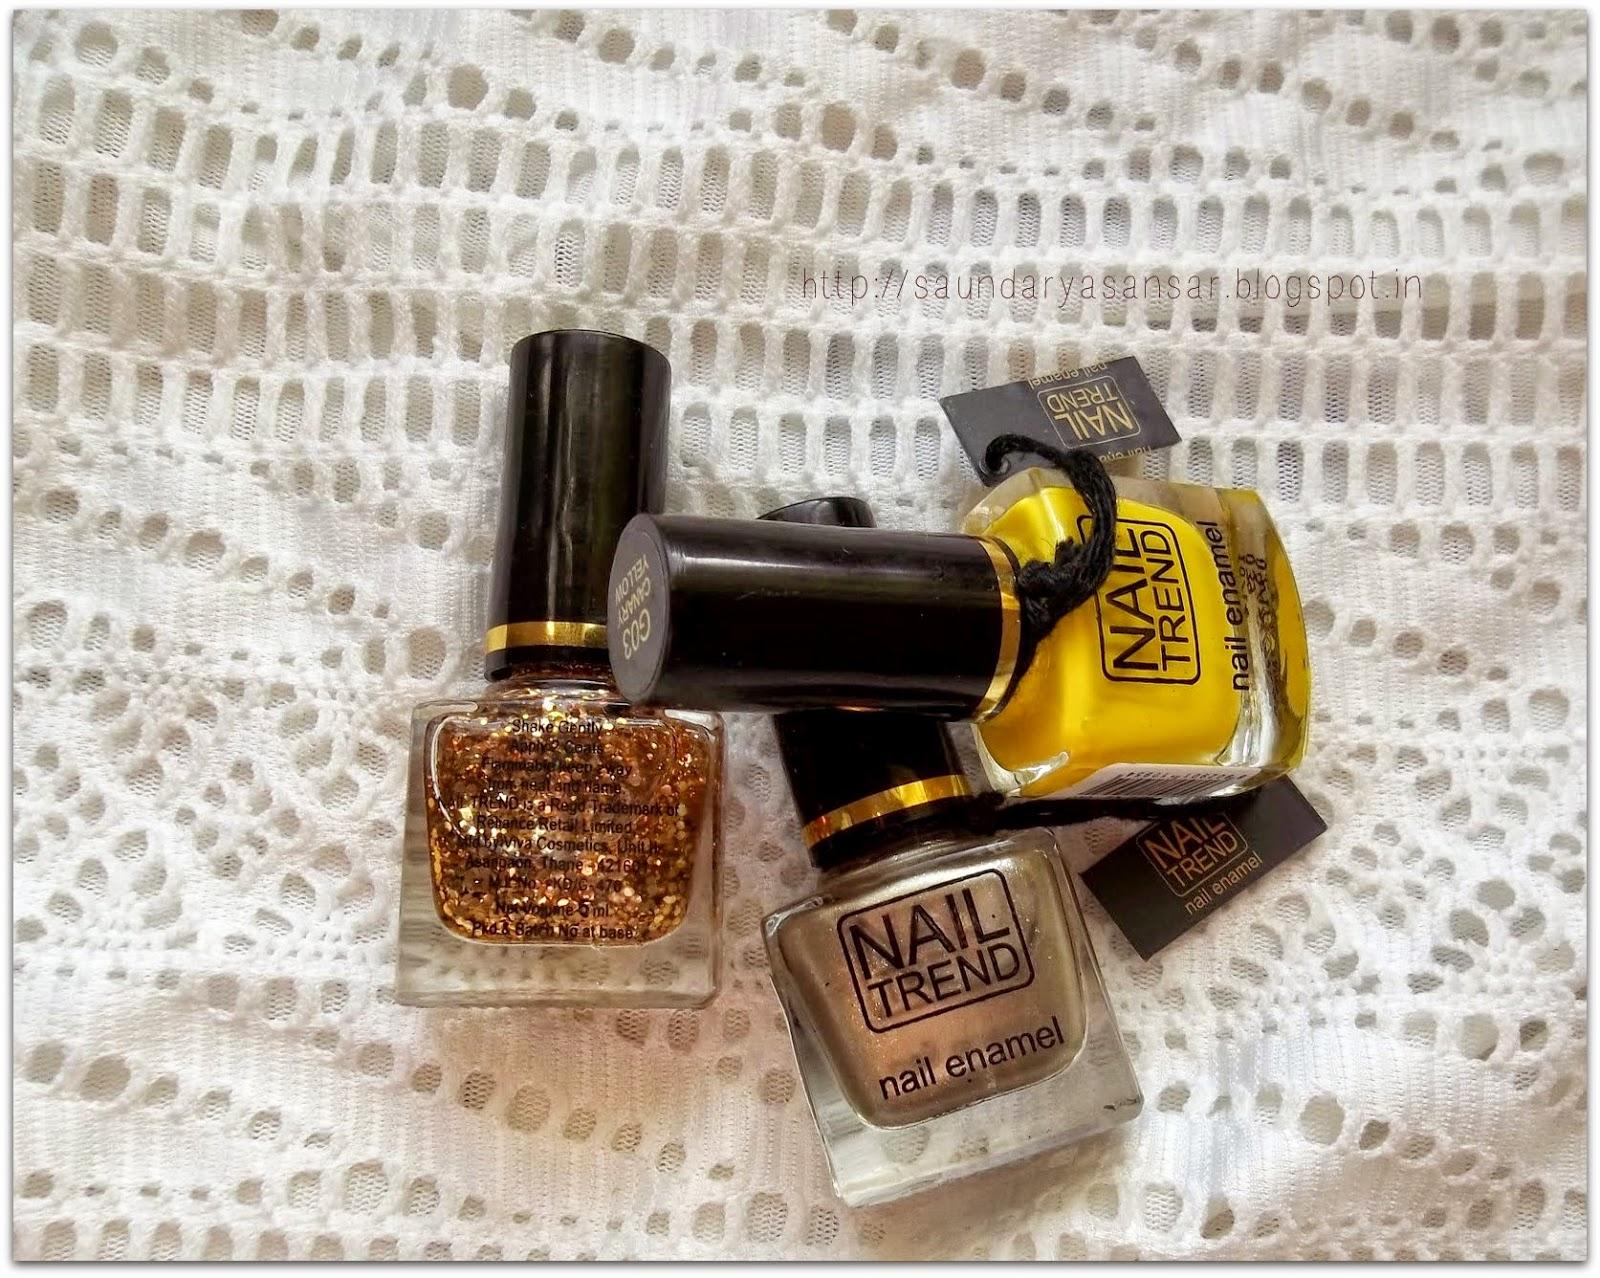 Nail Trend Nail Enamel- Review